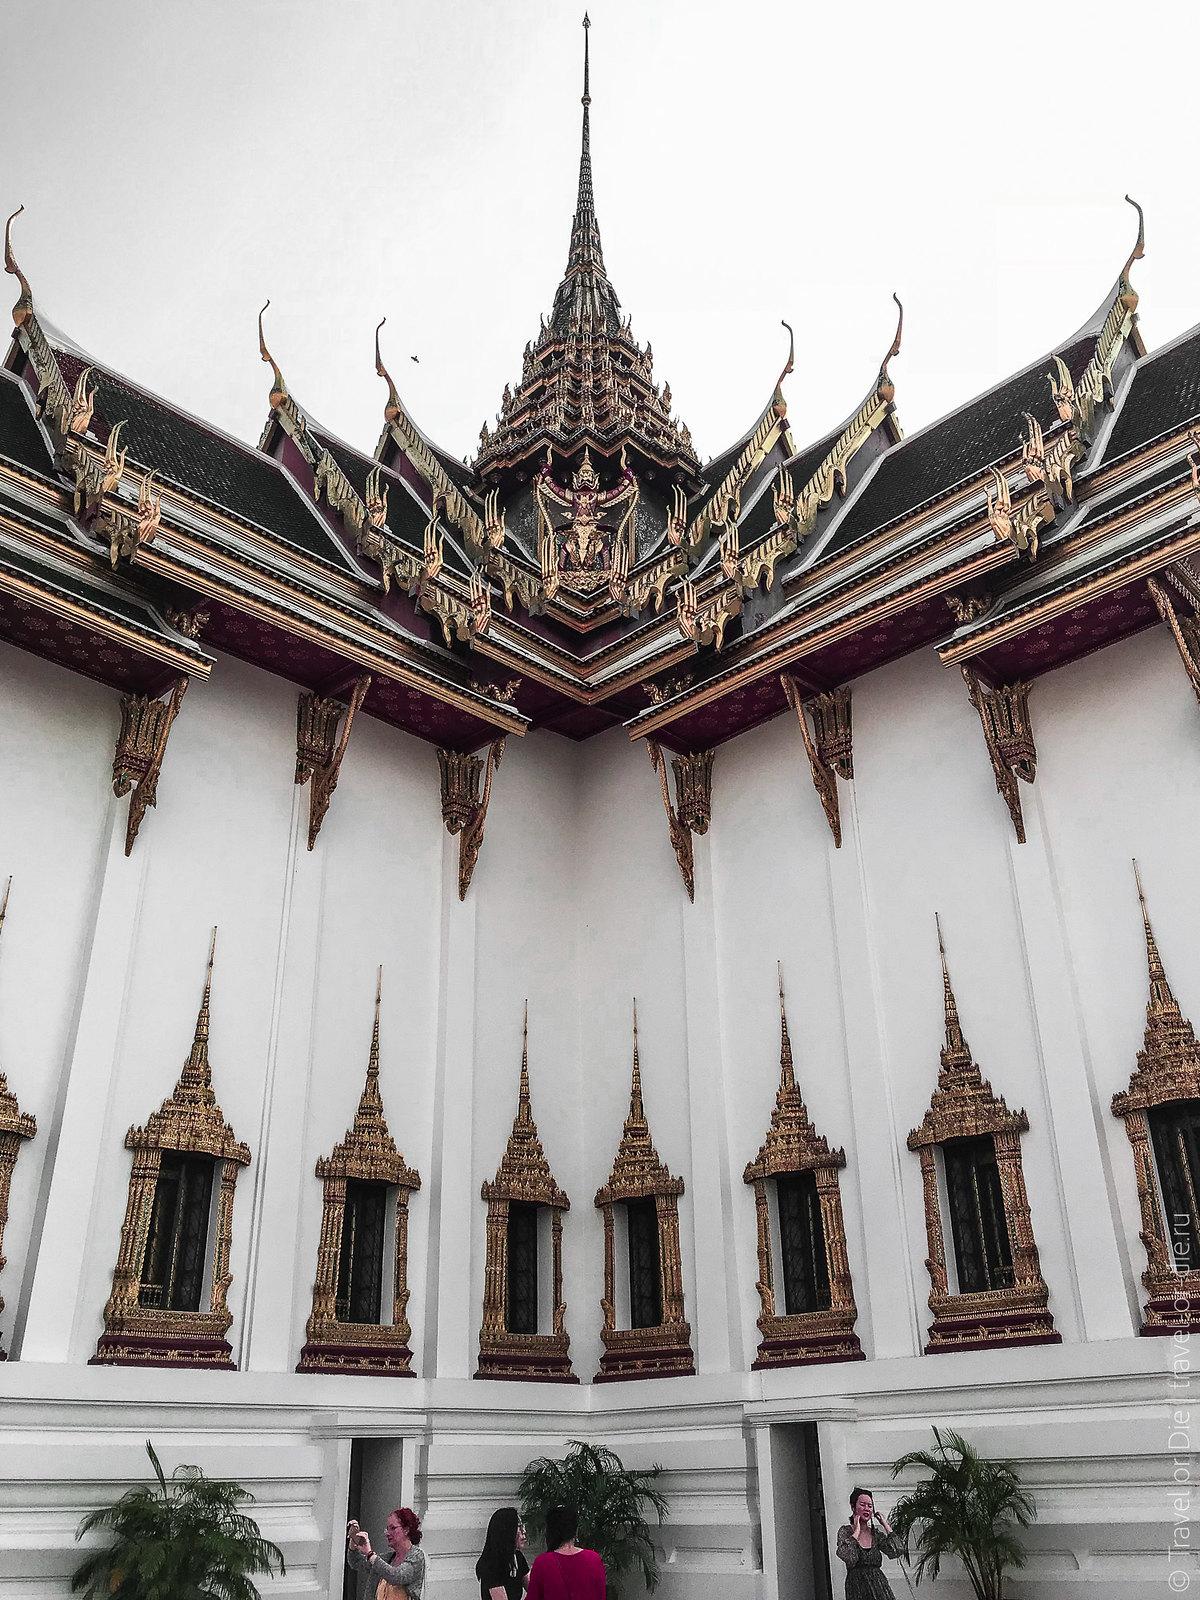 Grand-Palace-Bangkok-Королевский-дворец-Бангкок-9221